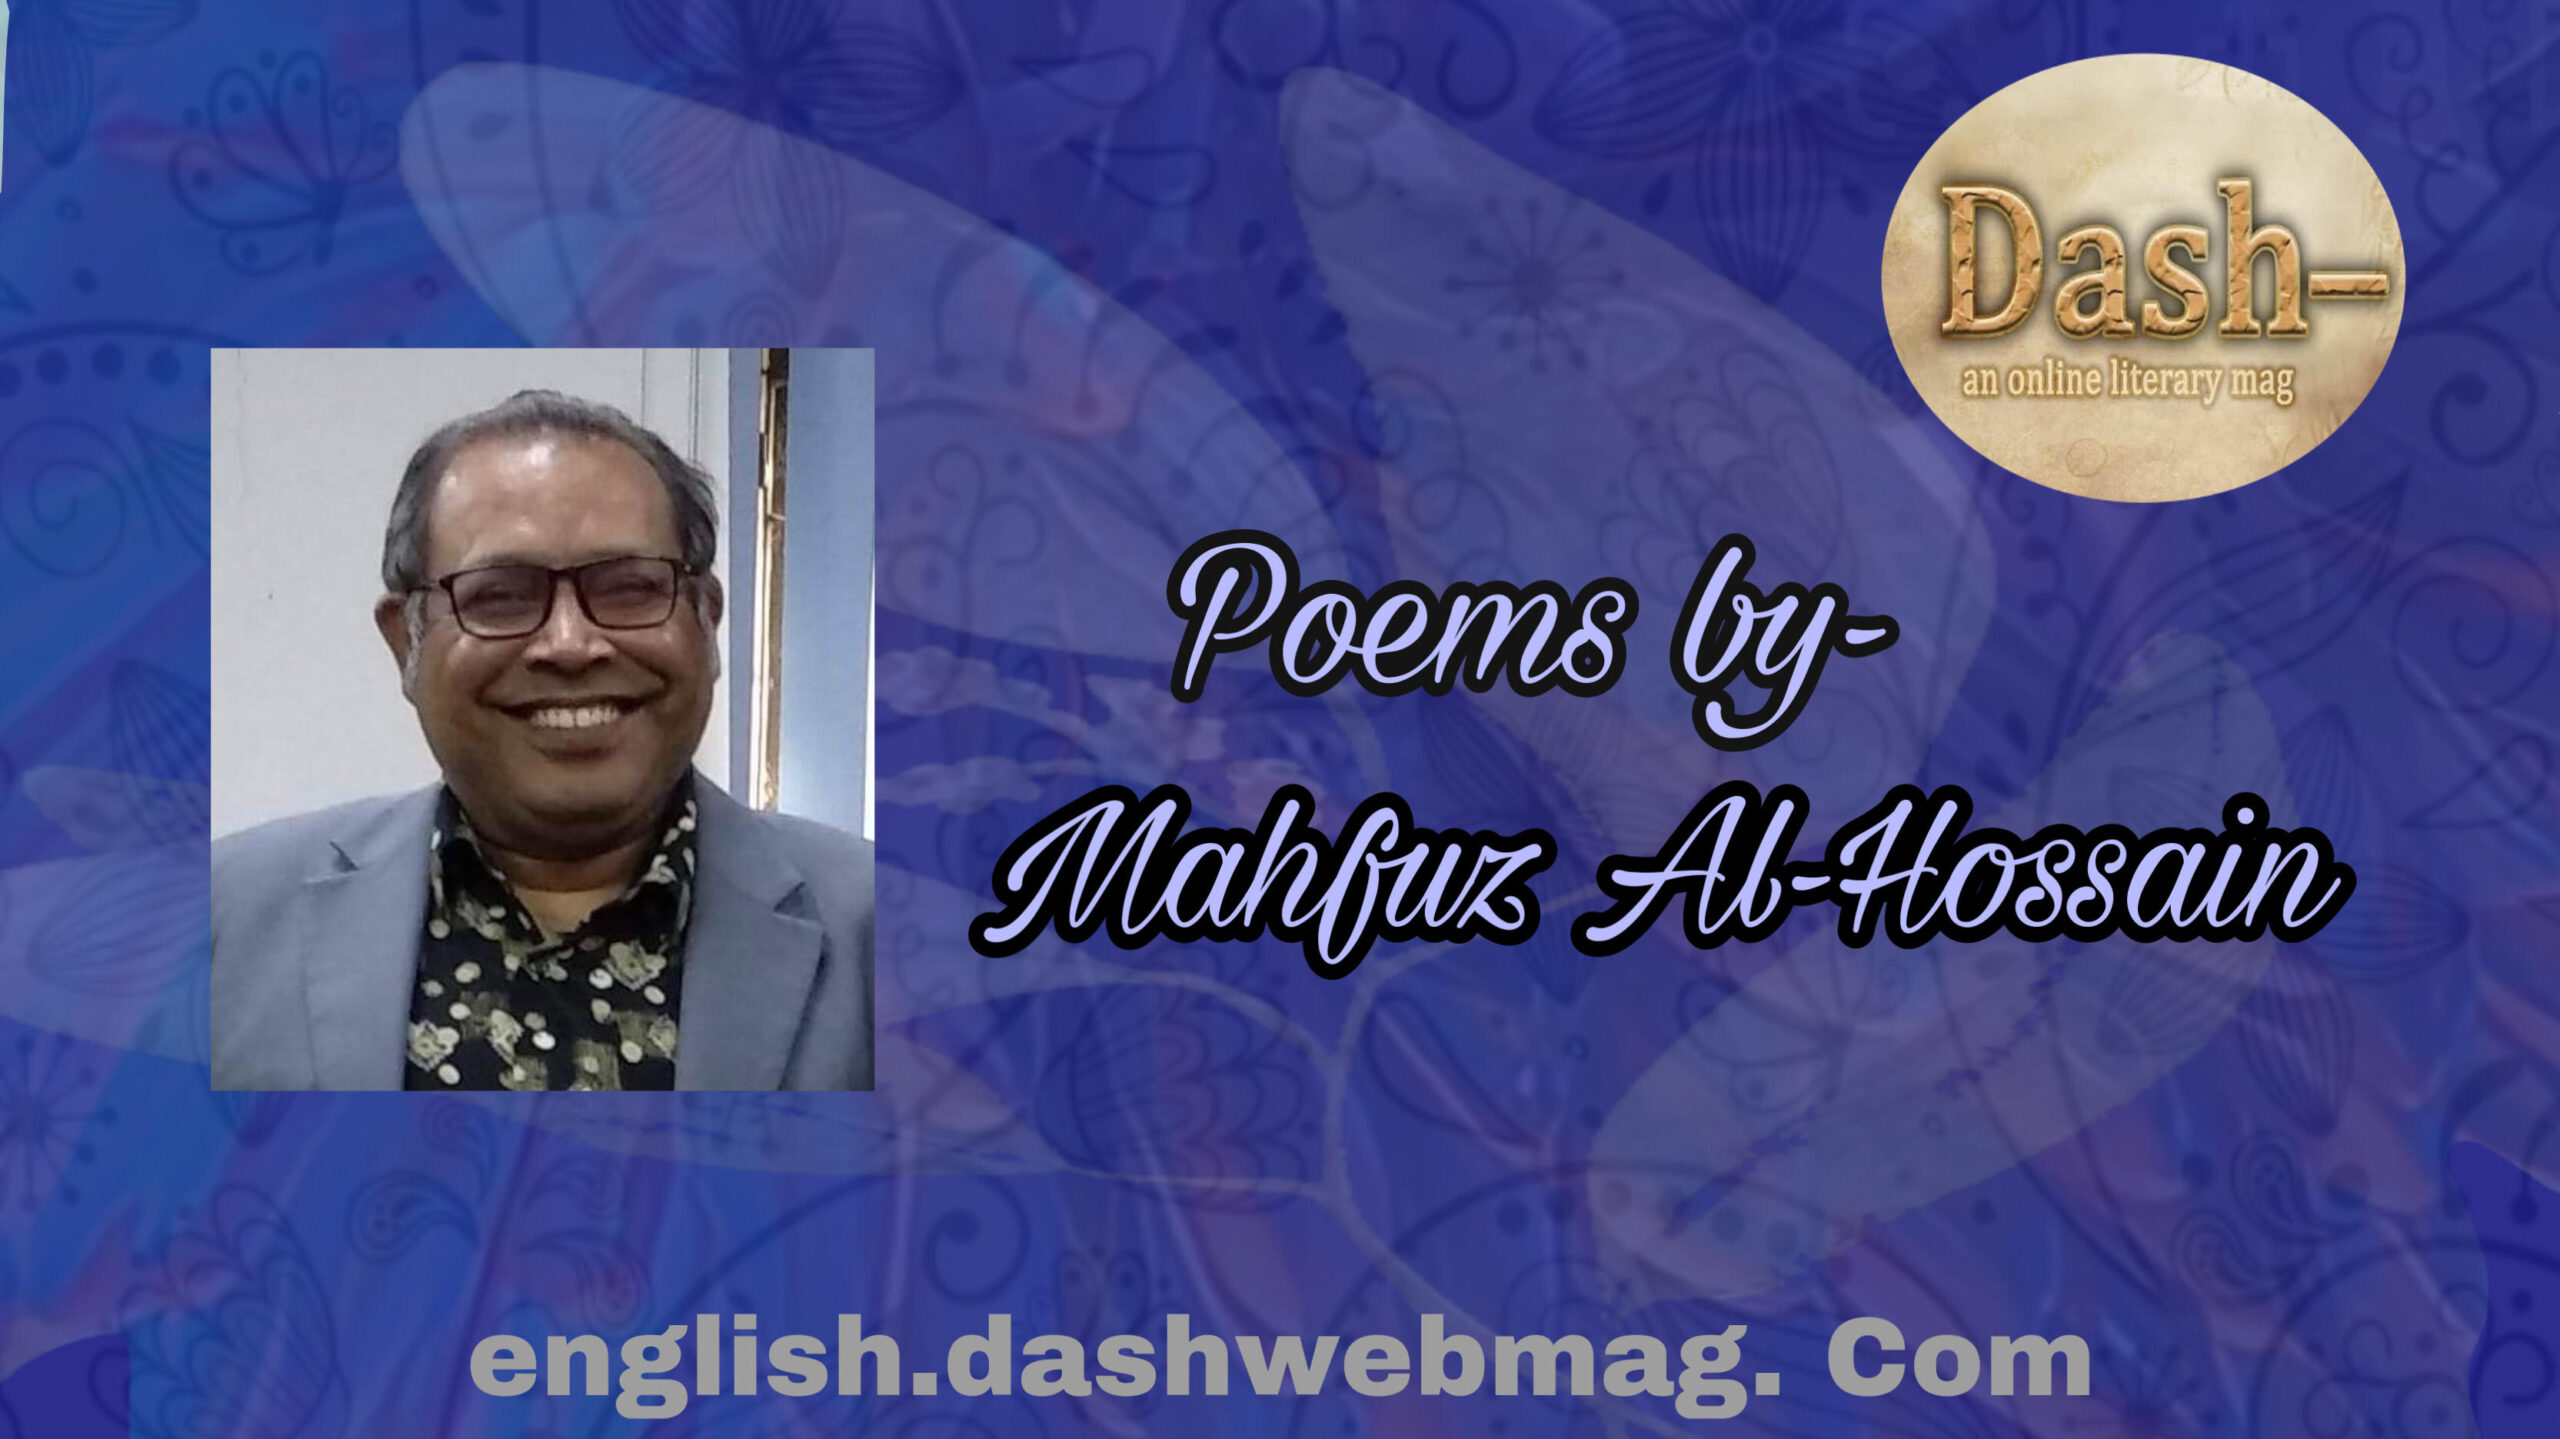 Poems by- Mahfuz Al-Hossain